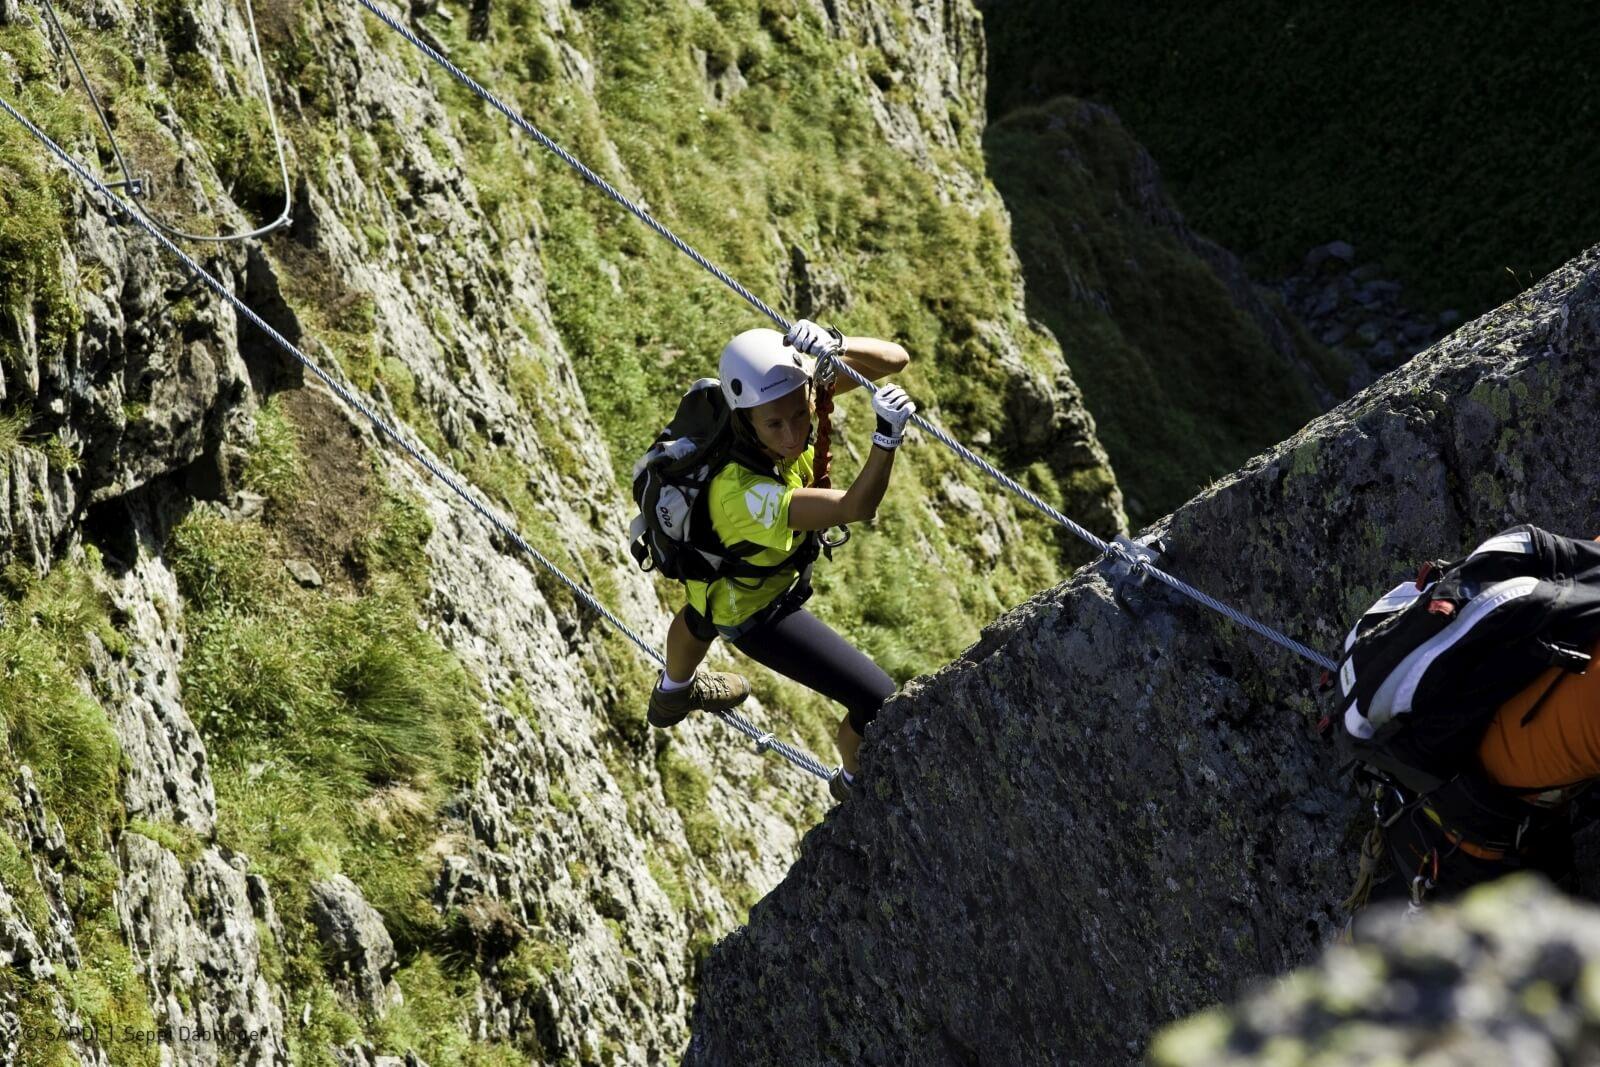 Heidi-Chalet-Falkert-Heidialm-Falkertsee-Klettern